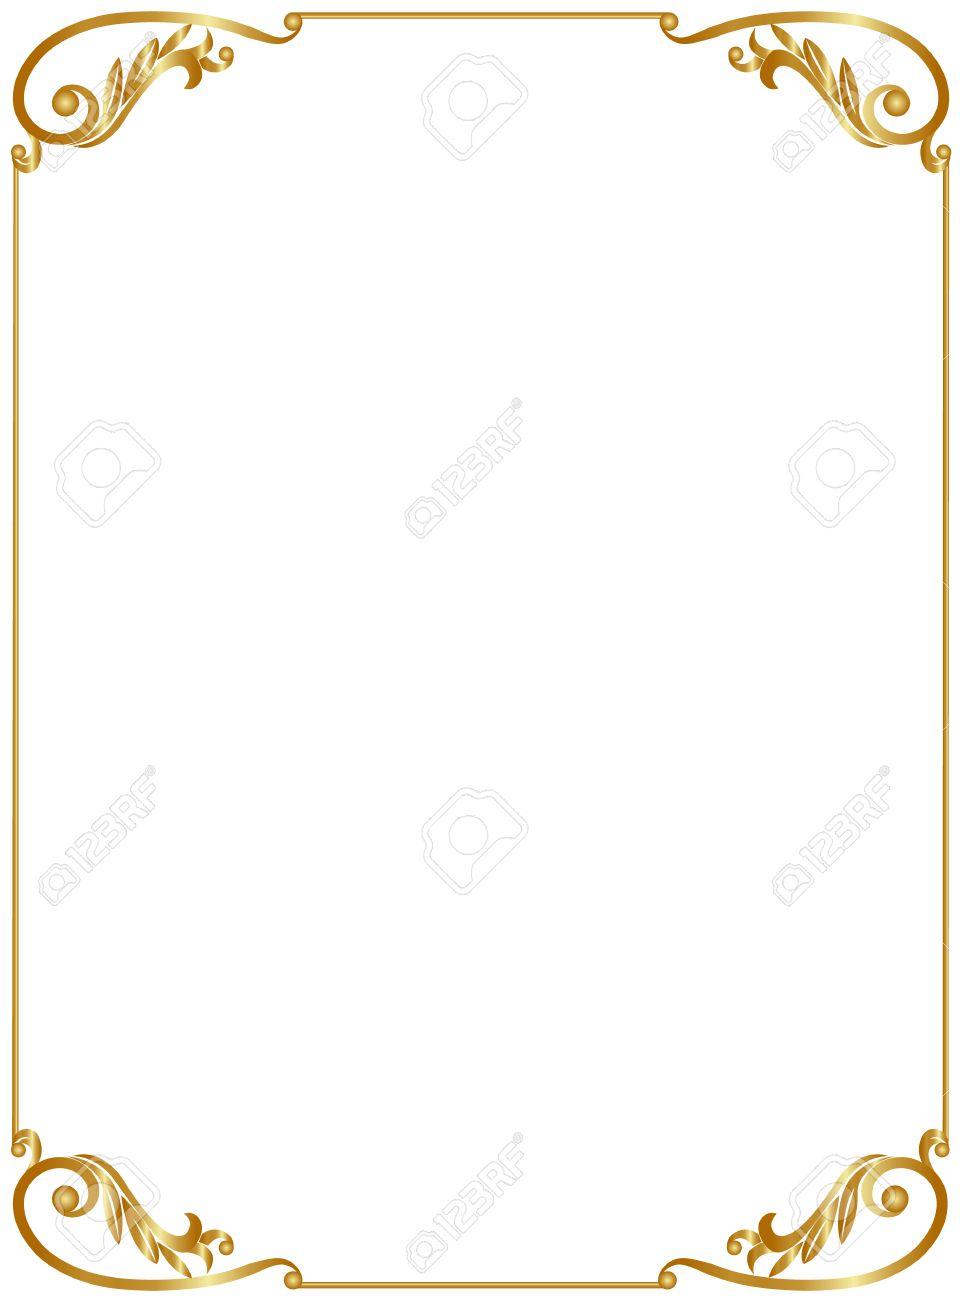 Group of Elegant Golden Frame On